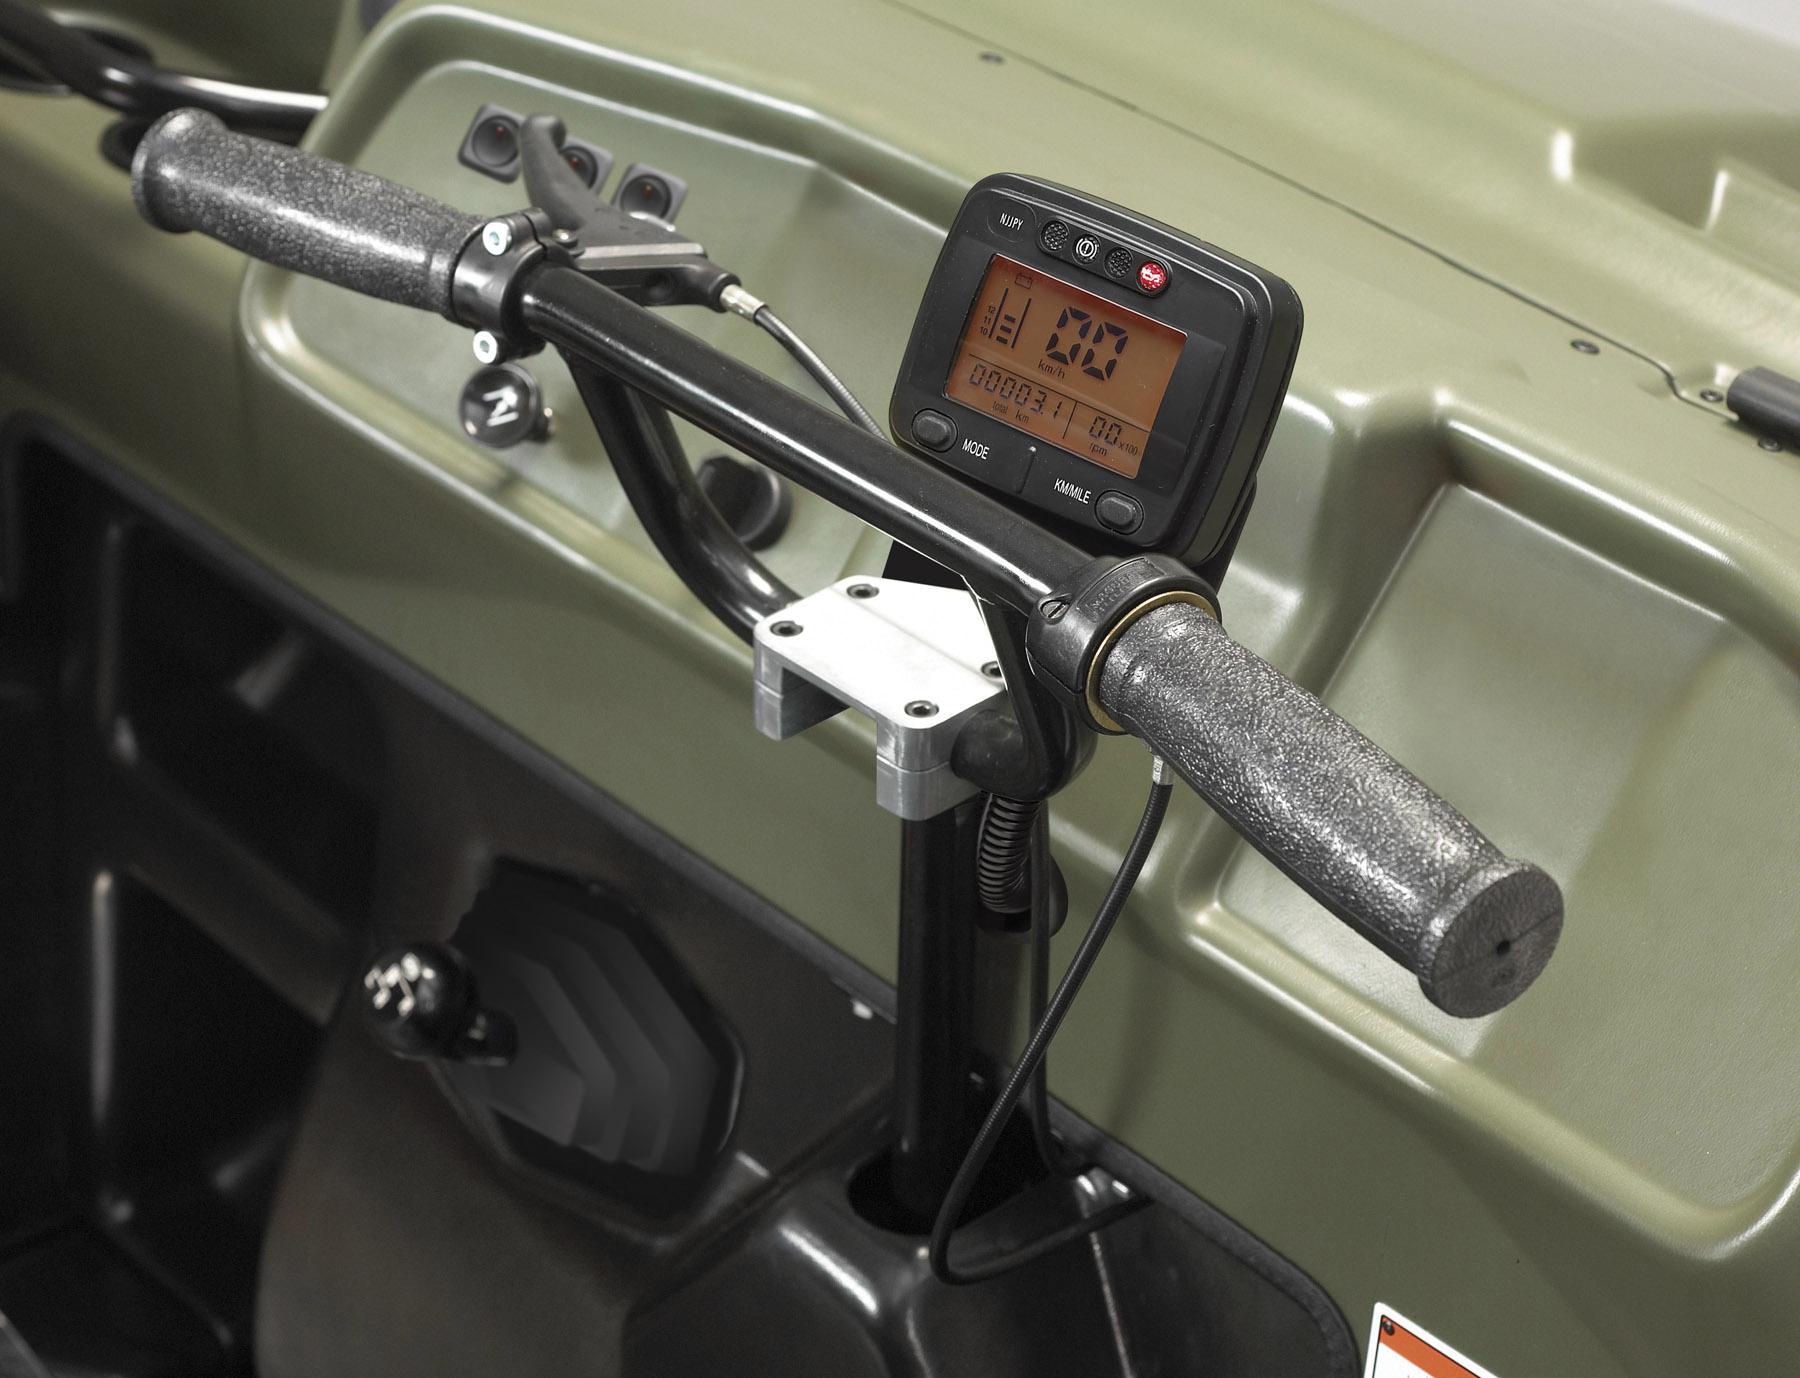 8x8 750 EFI - Shank's Argo